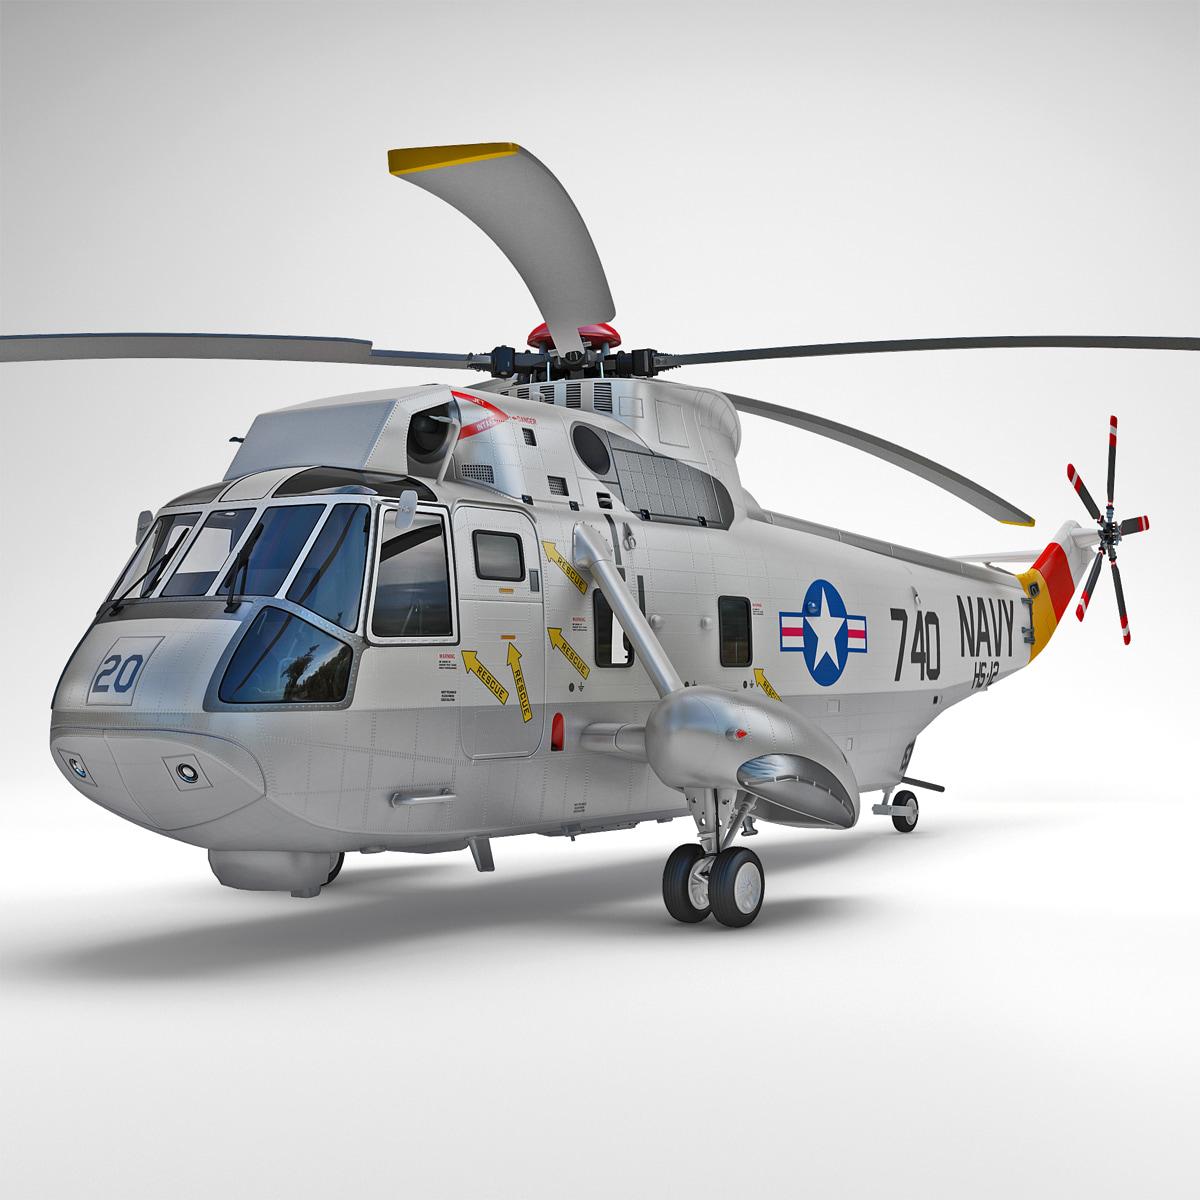 SH-3 Sea King_2.jpg